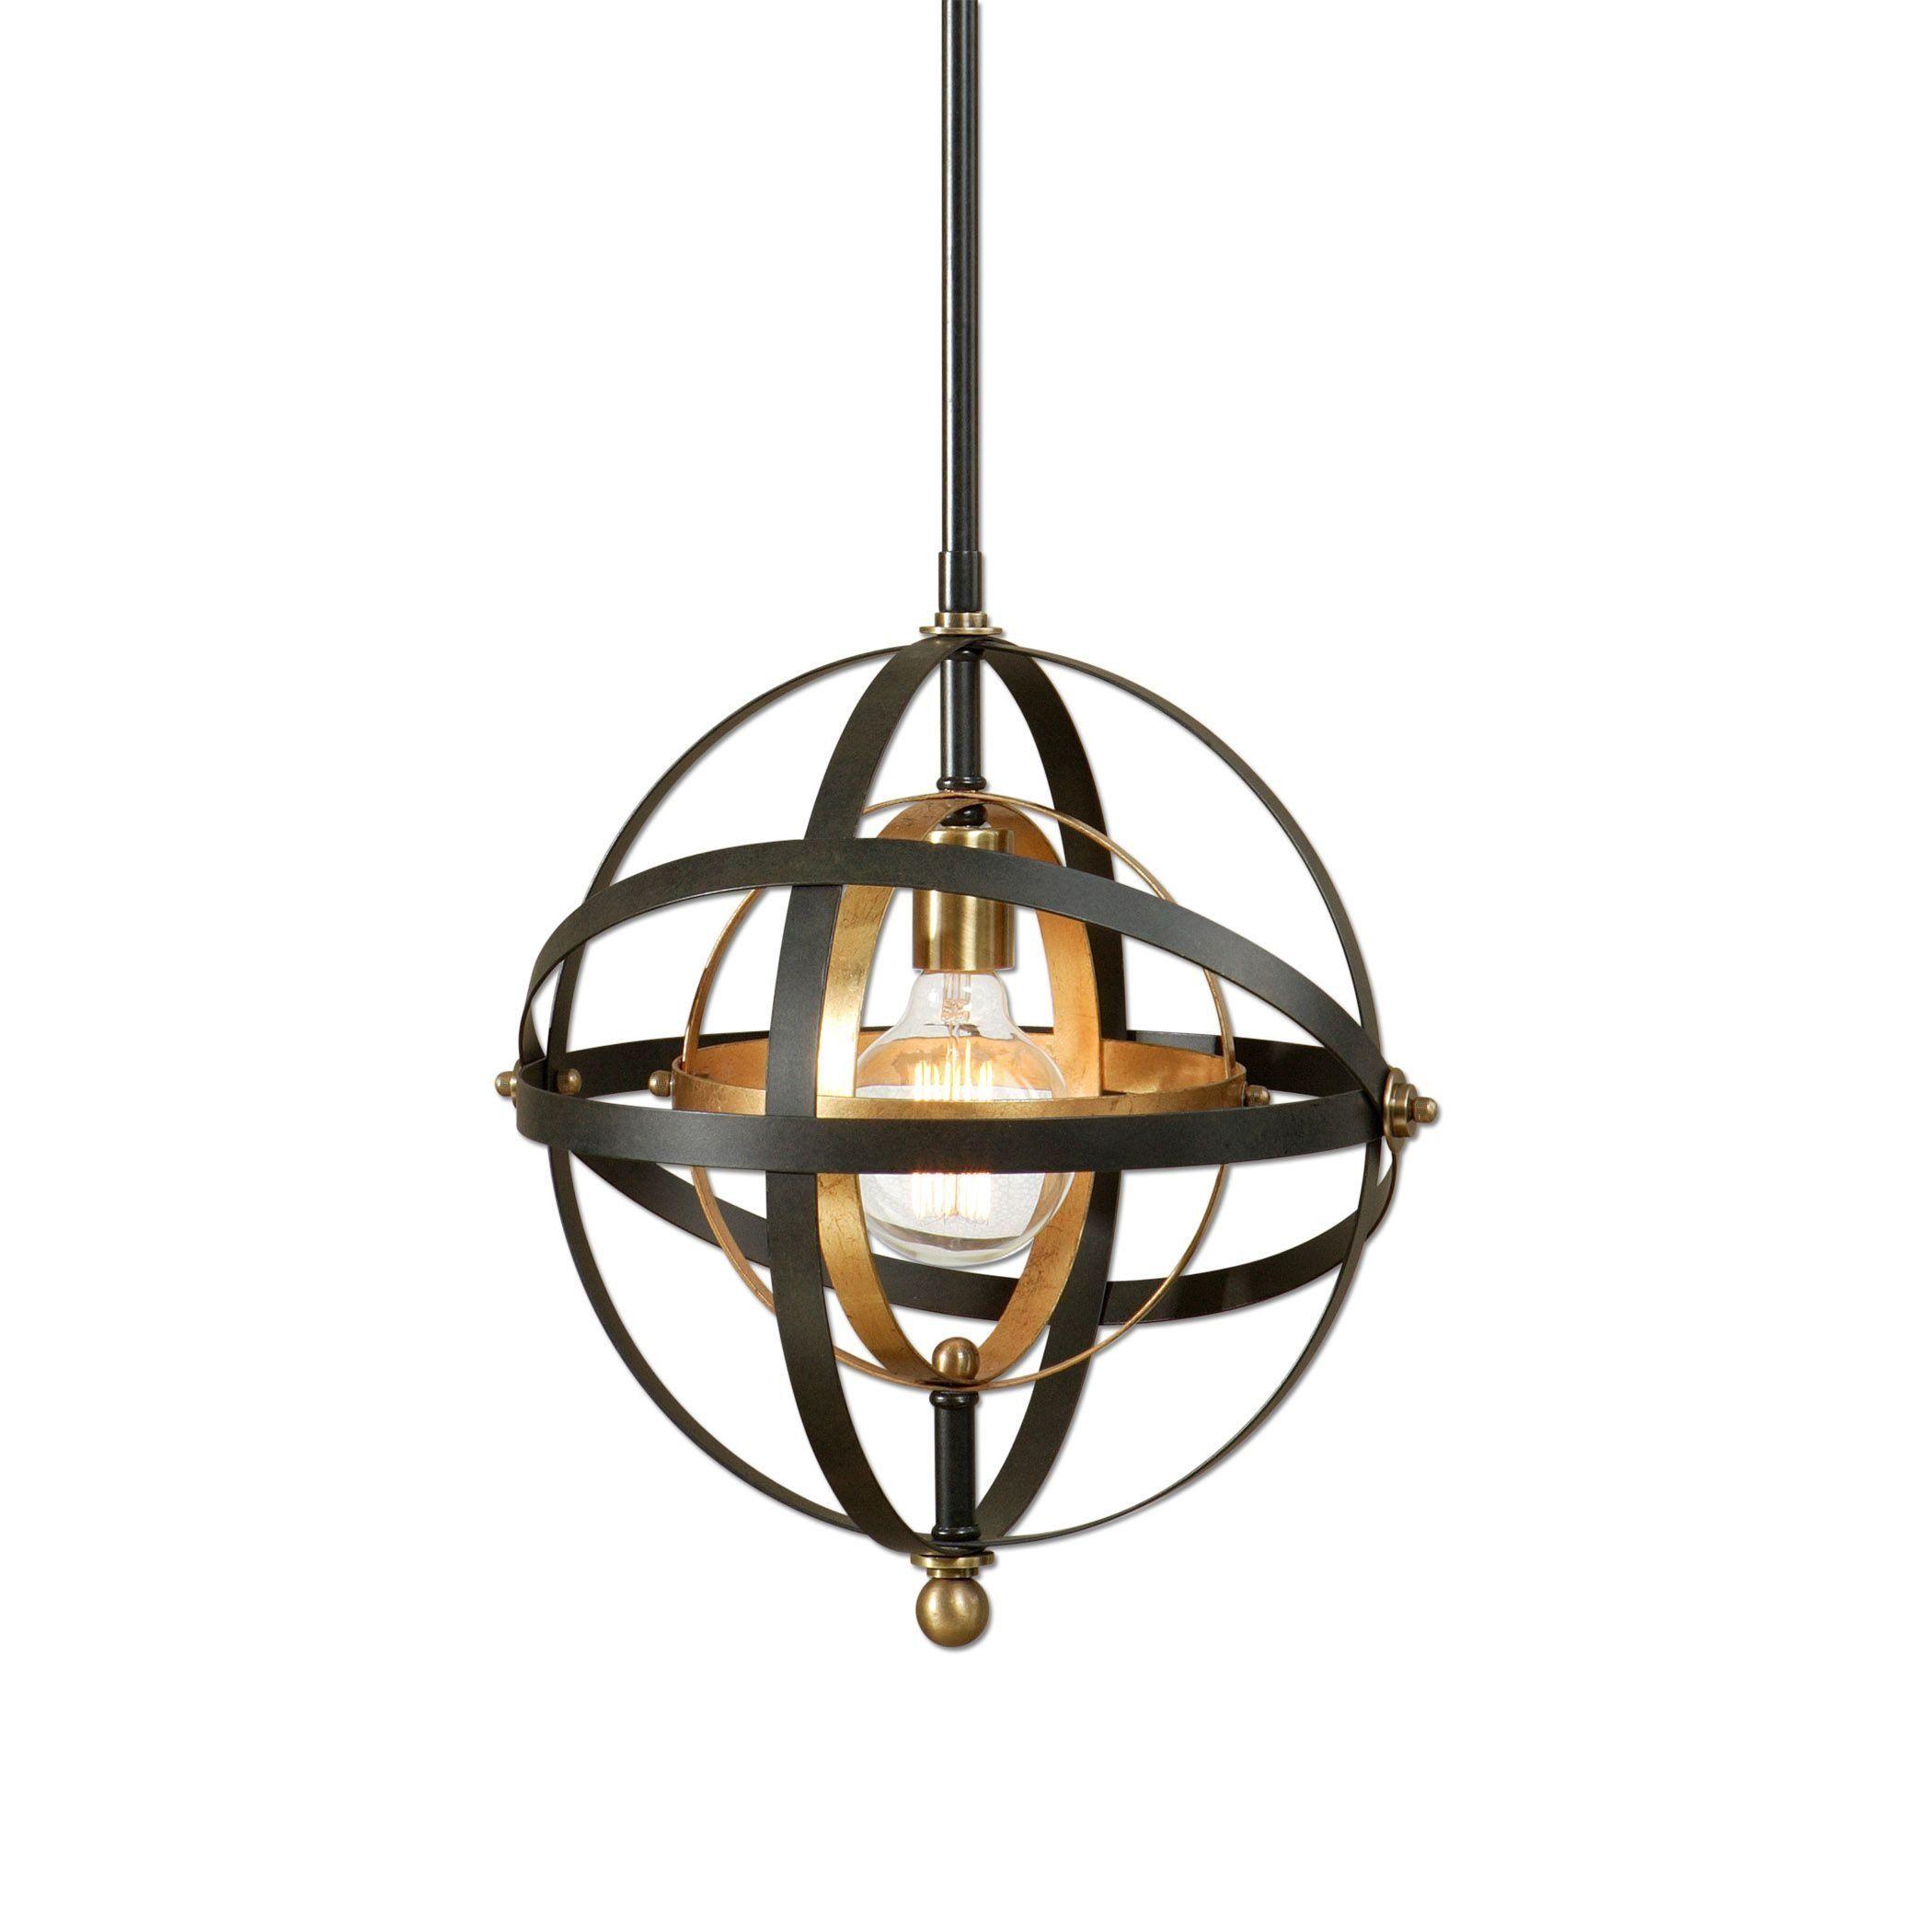 Jl Home Design Utah: Rondure 1-Light Sphere Pendant Lighting Fixture By